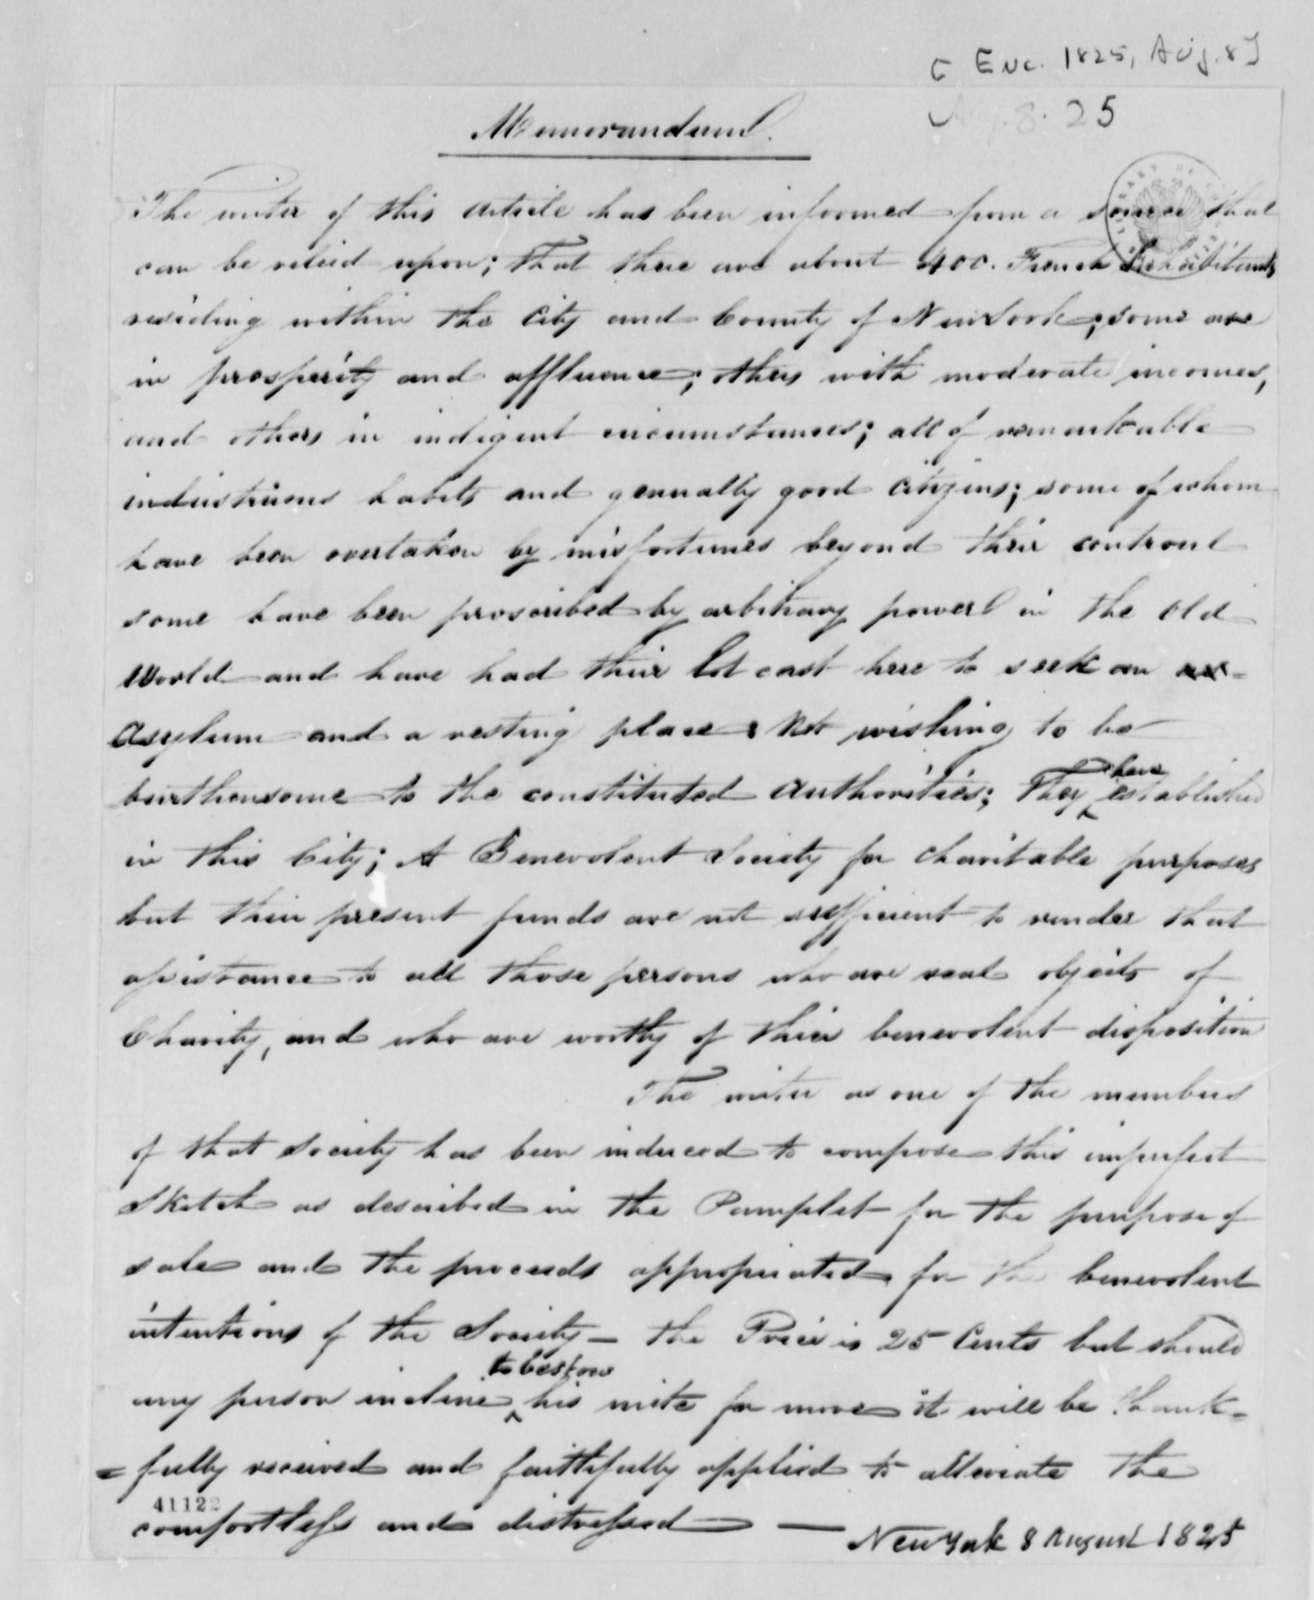 Gurdon S. Mumford to Thomas Jefferson, August 8, 1825, with Memorandum